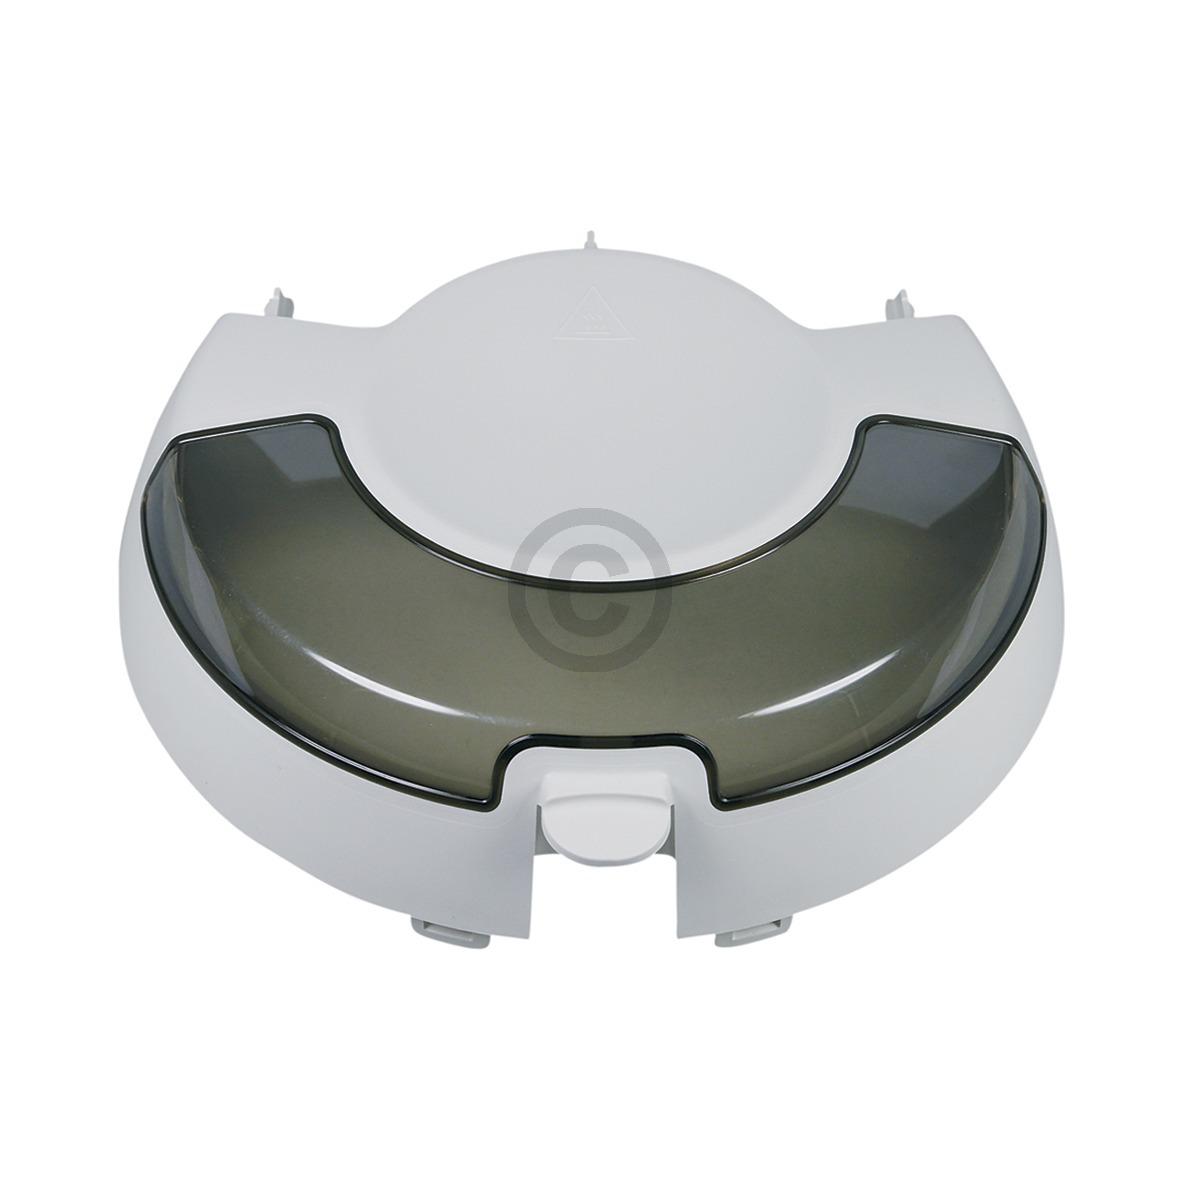 Deckel für Heissluft-Fritteuse Tefal ActiFry SS-993603 Krups Moulinex Rowenta Te